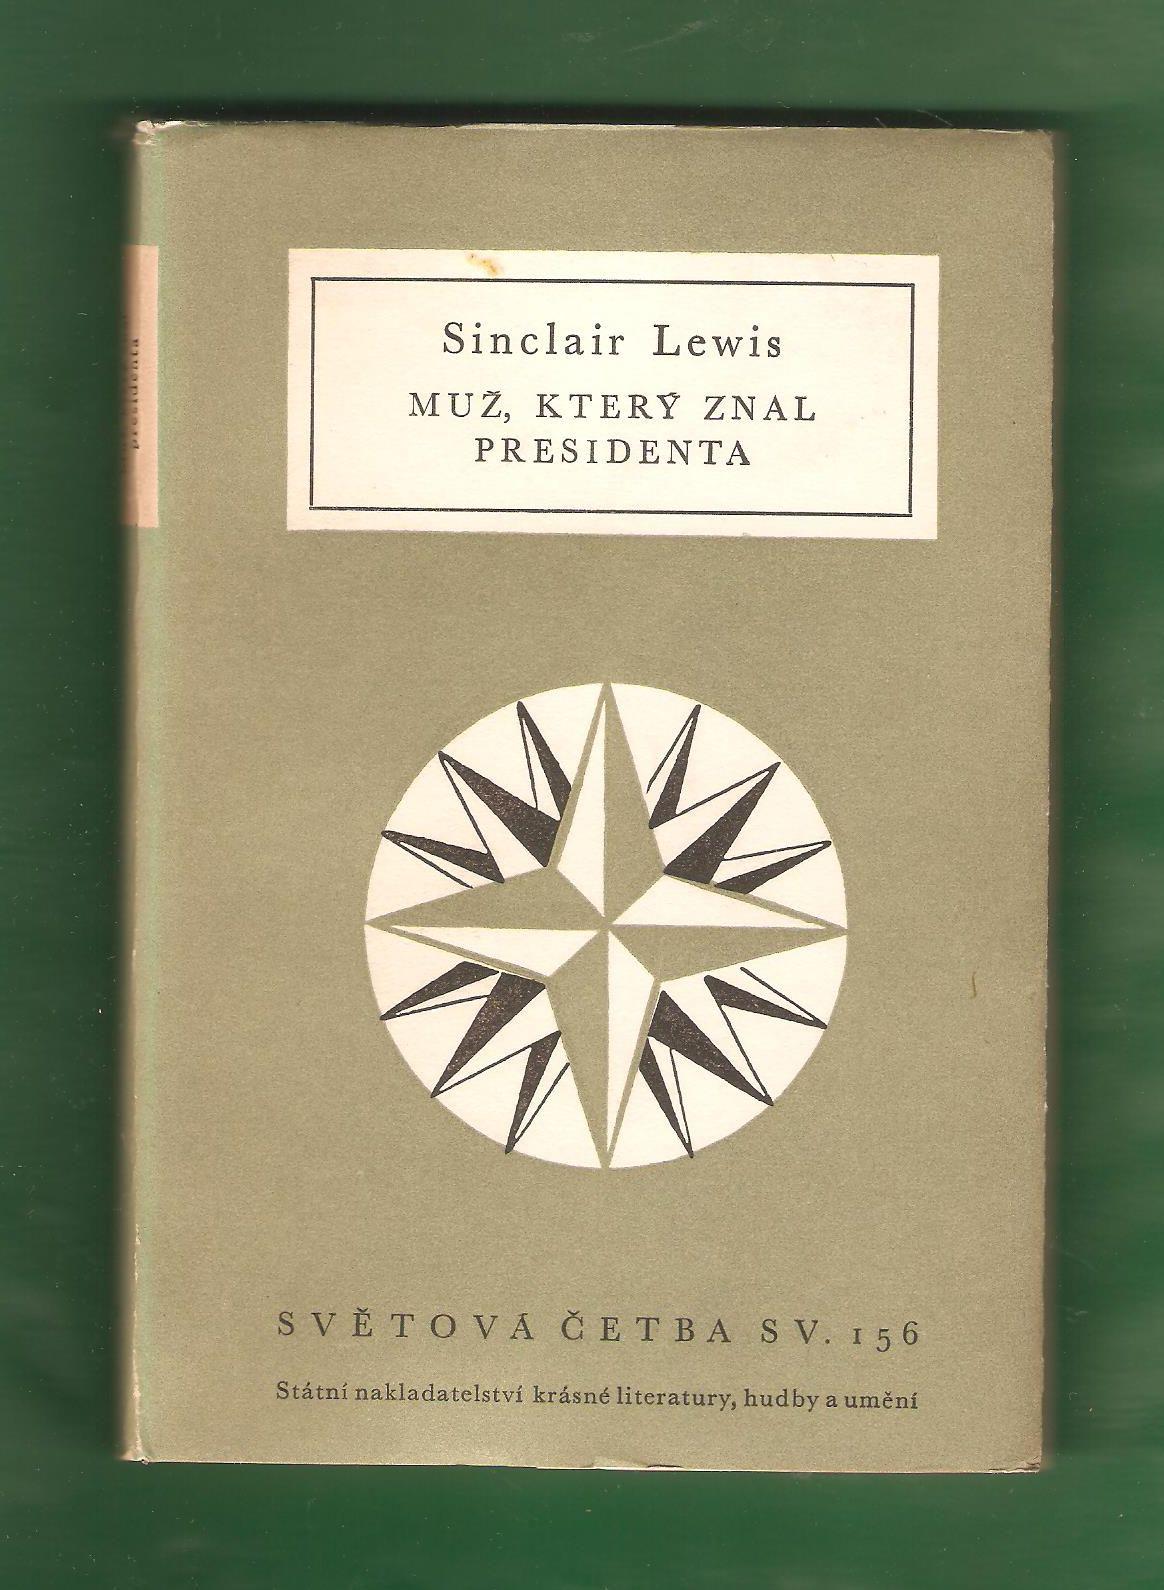 Muž, který znal presidenta - Sinclair Lewis